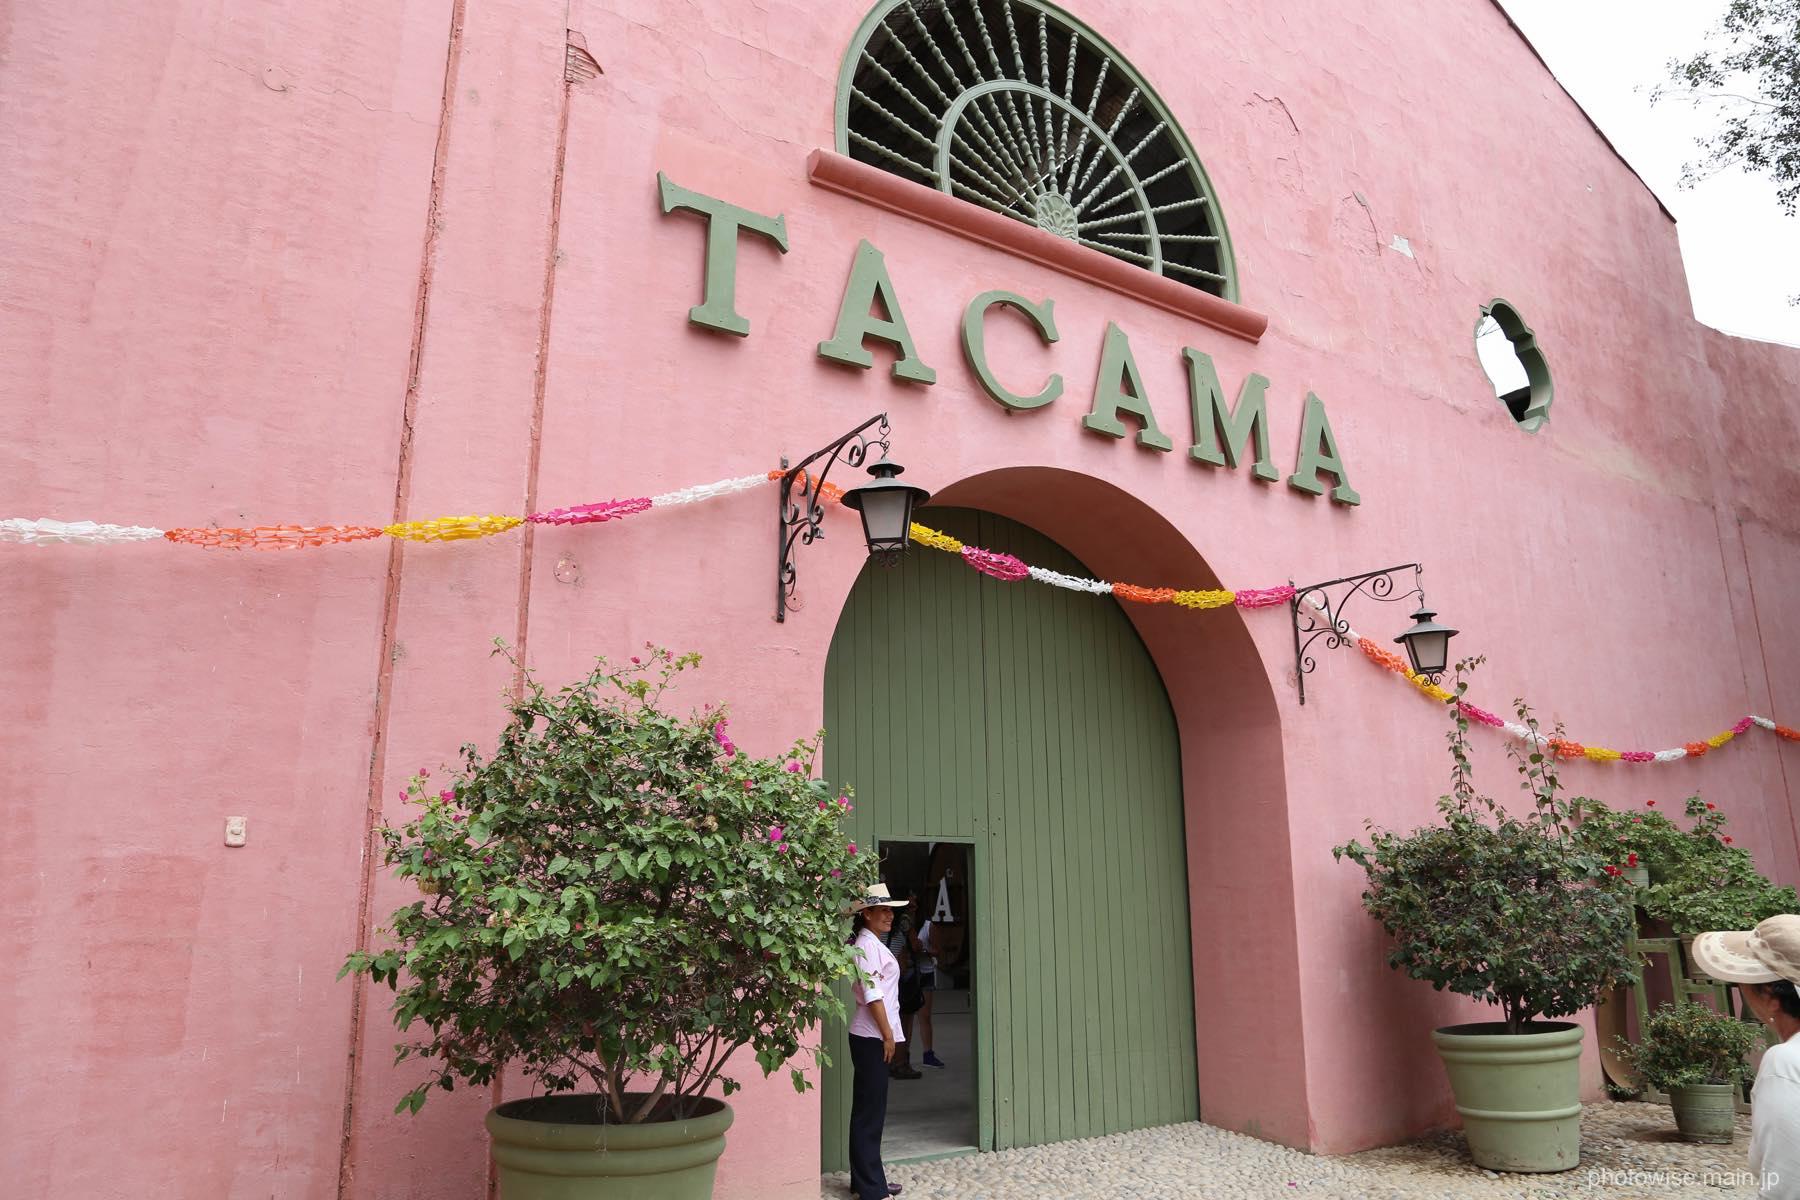 tacamaの倉庫